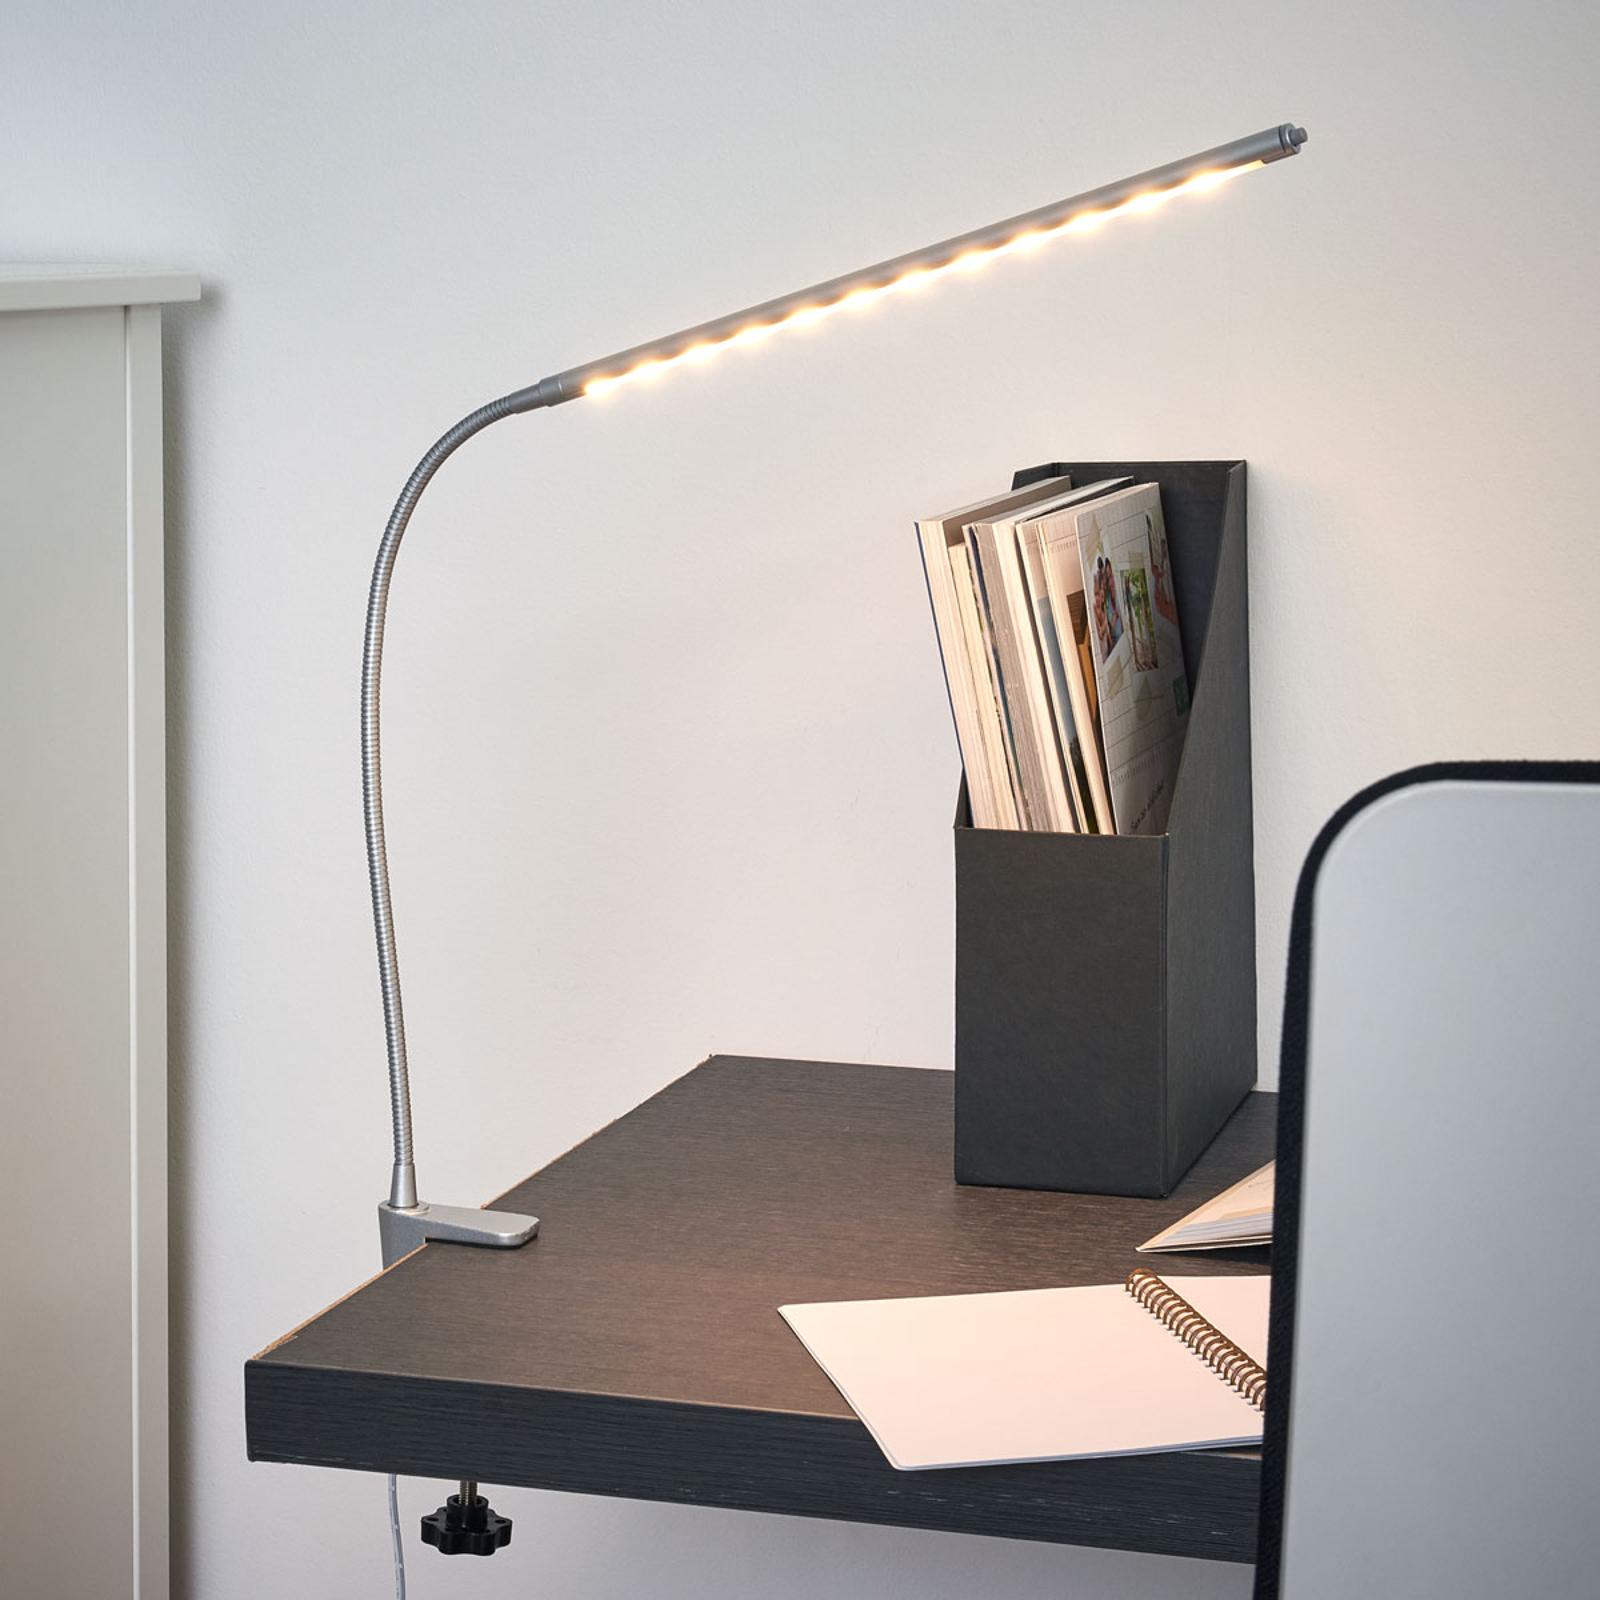 Bright clip-on LED lamp Anka with flex arm_7007404_1